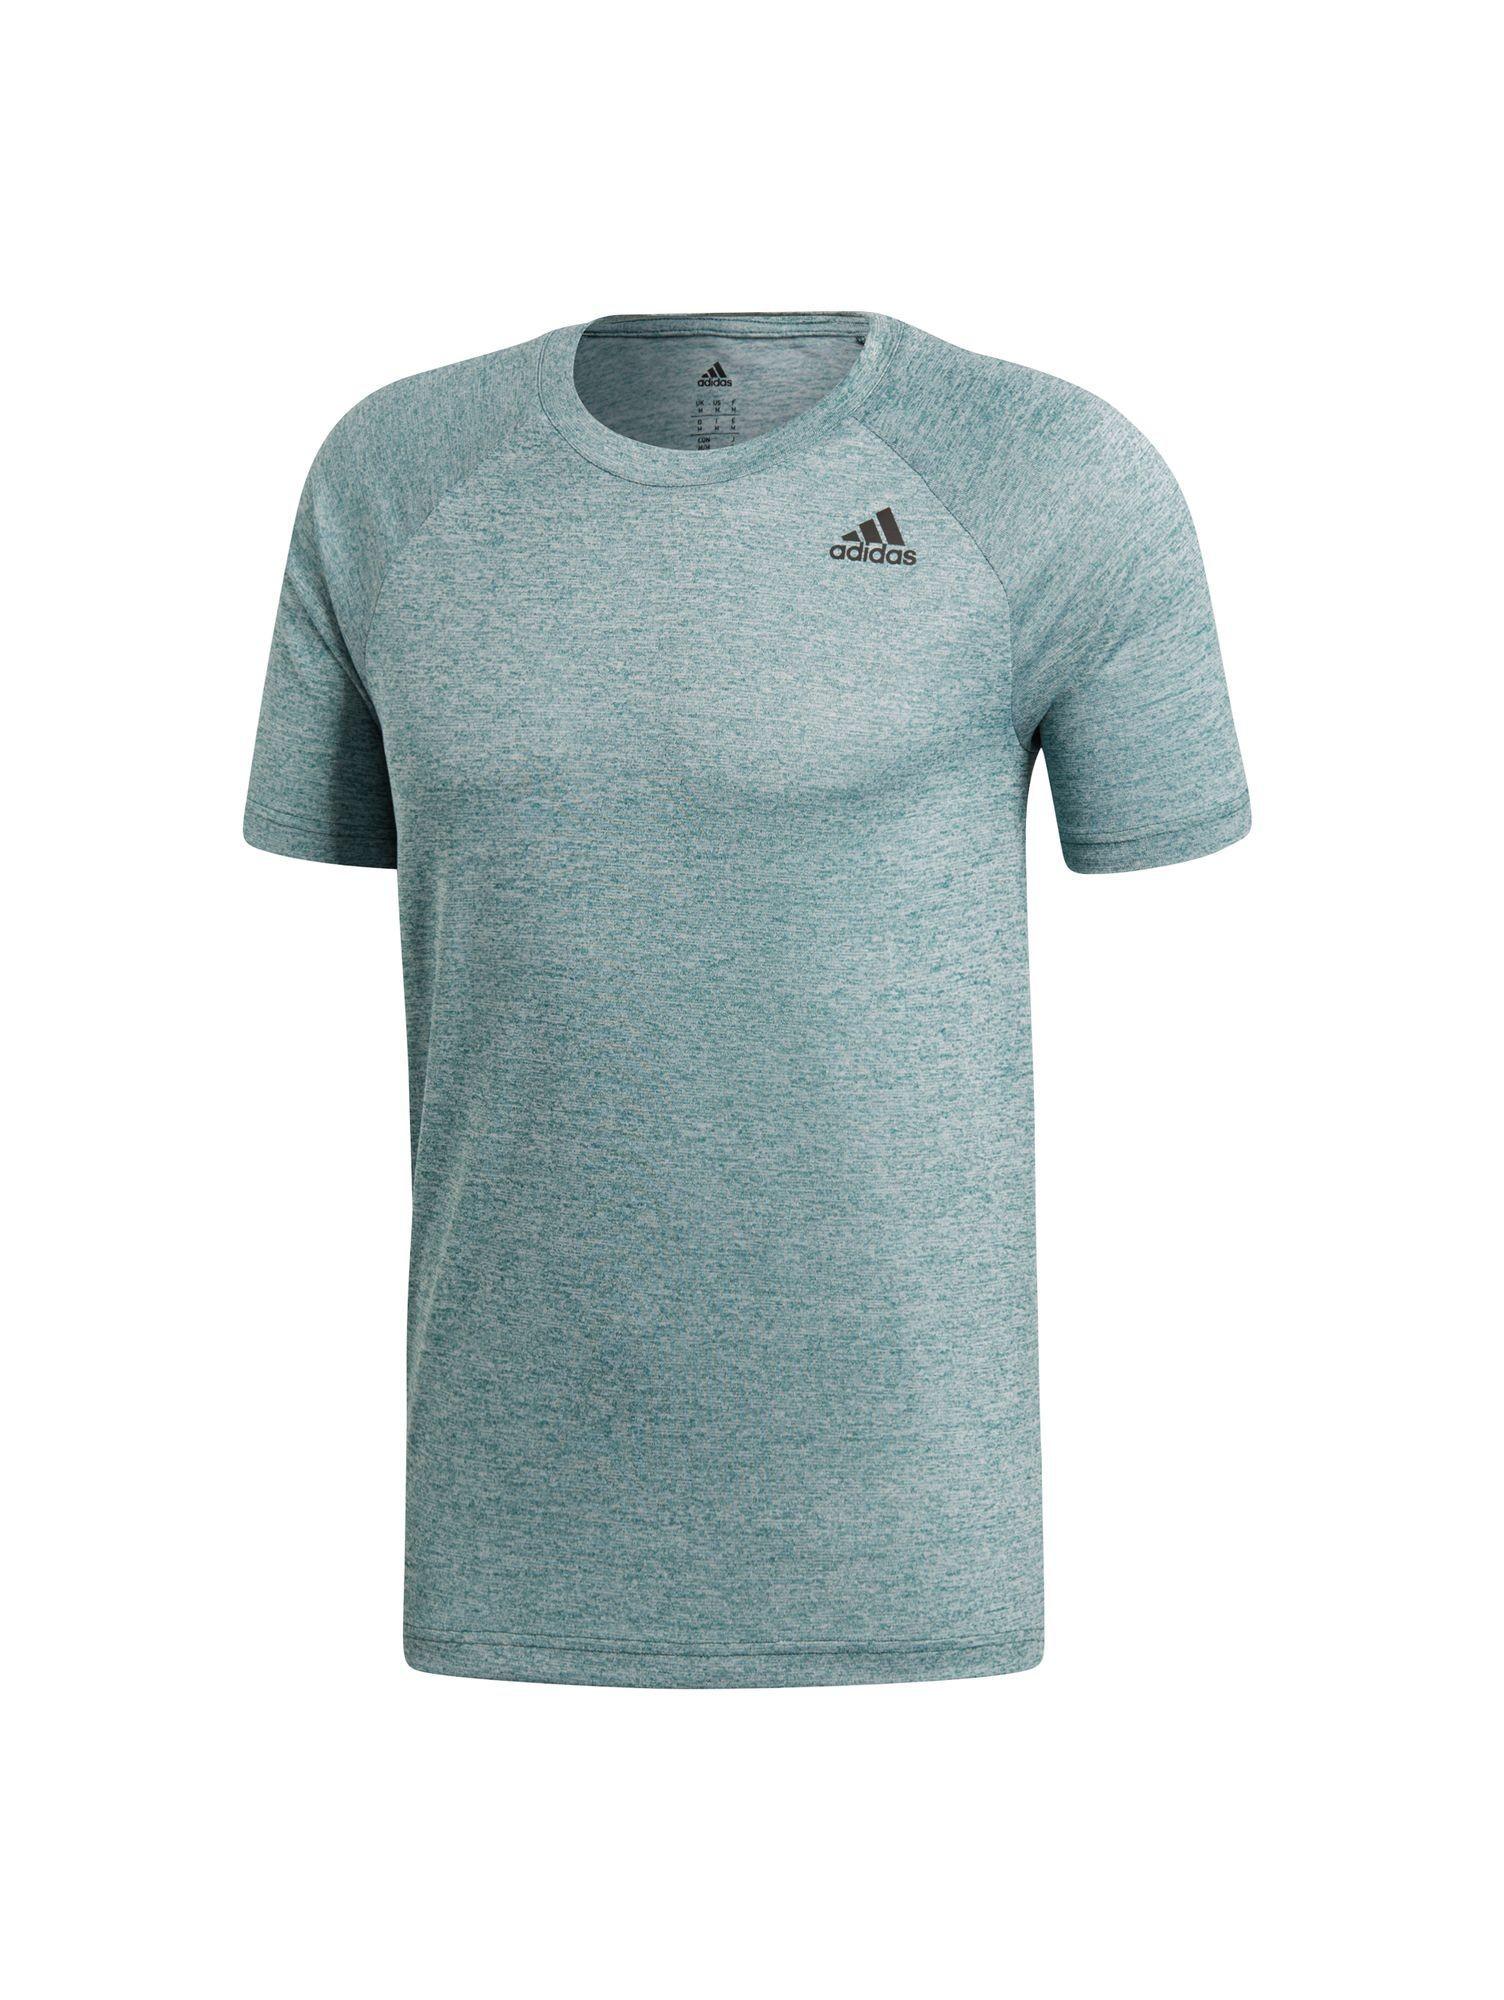 Adidas D2M Heathered T-Shirt